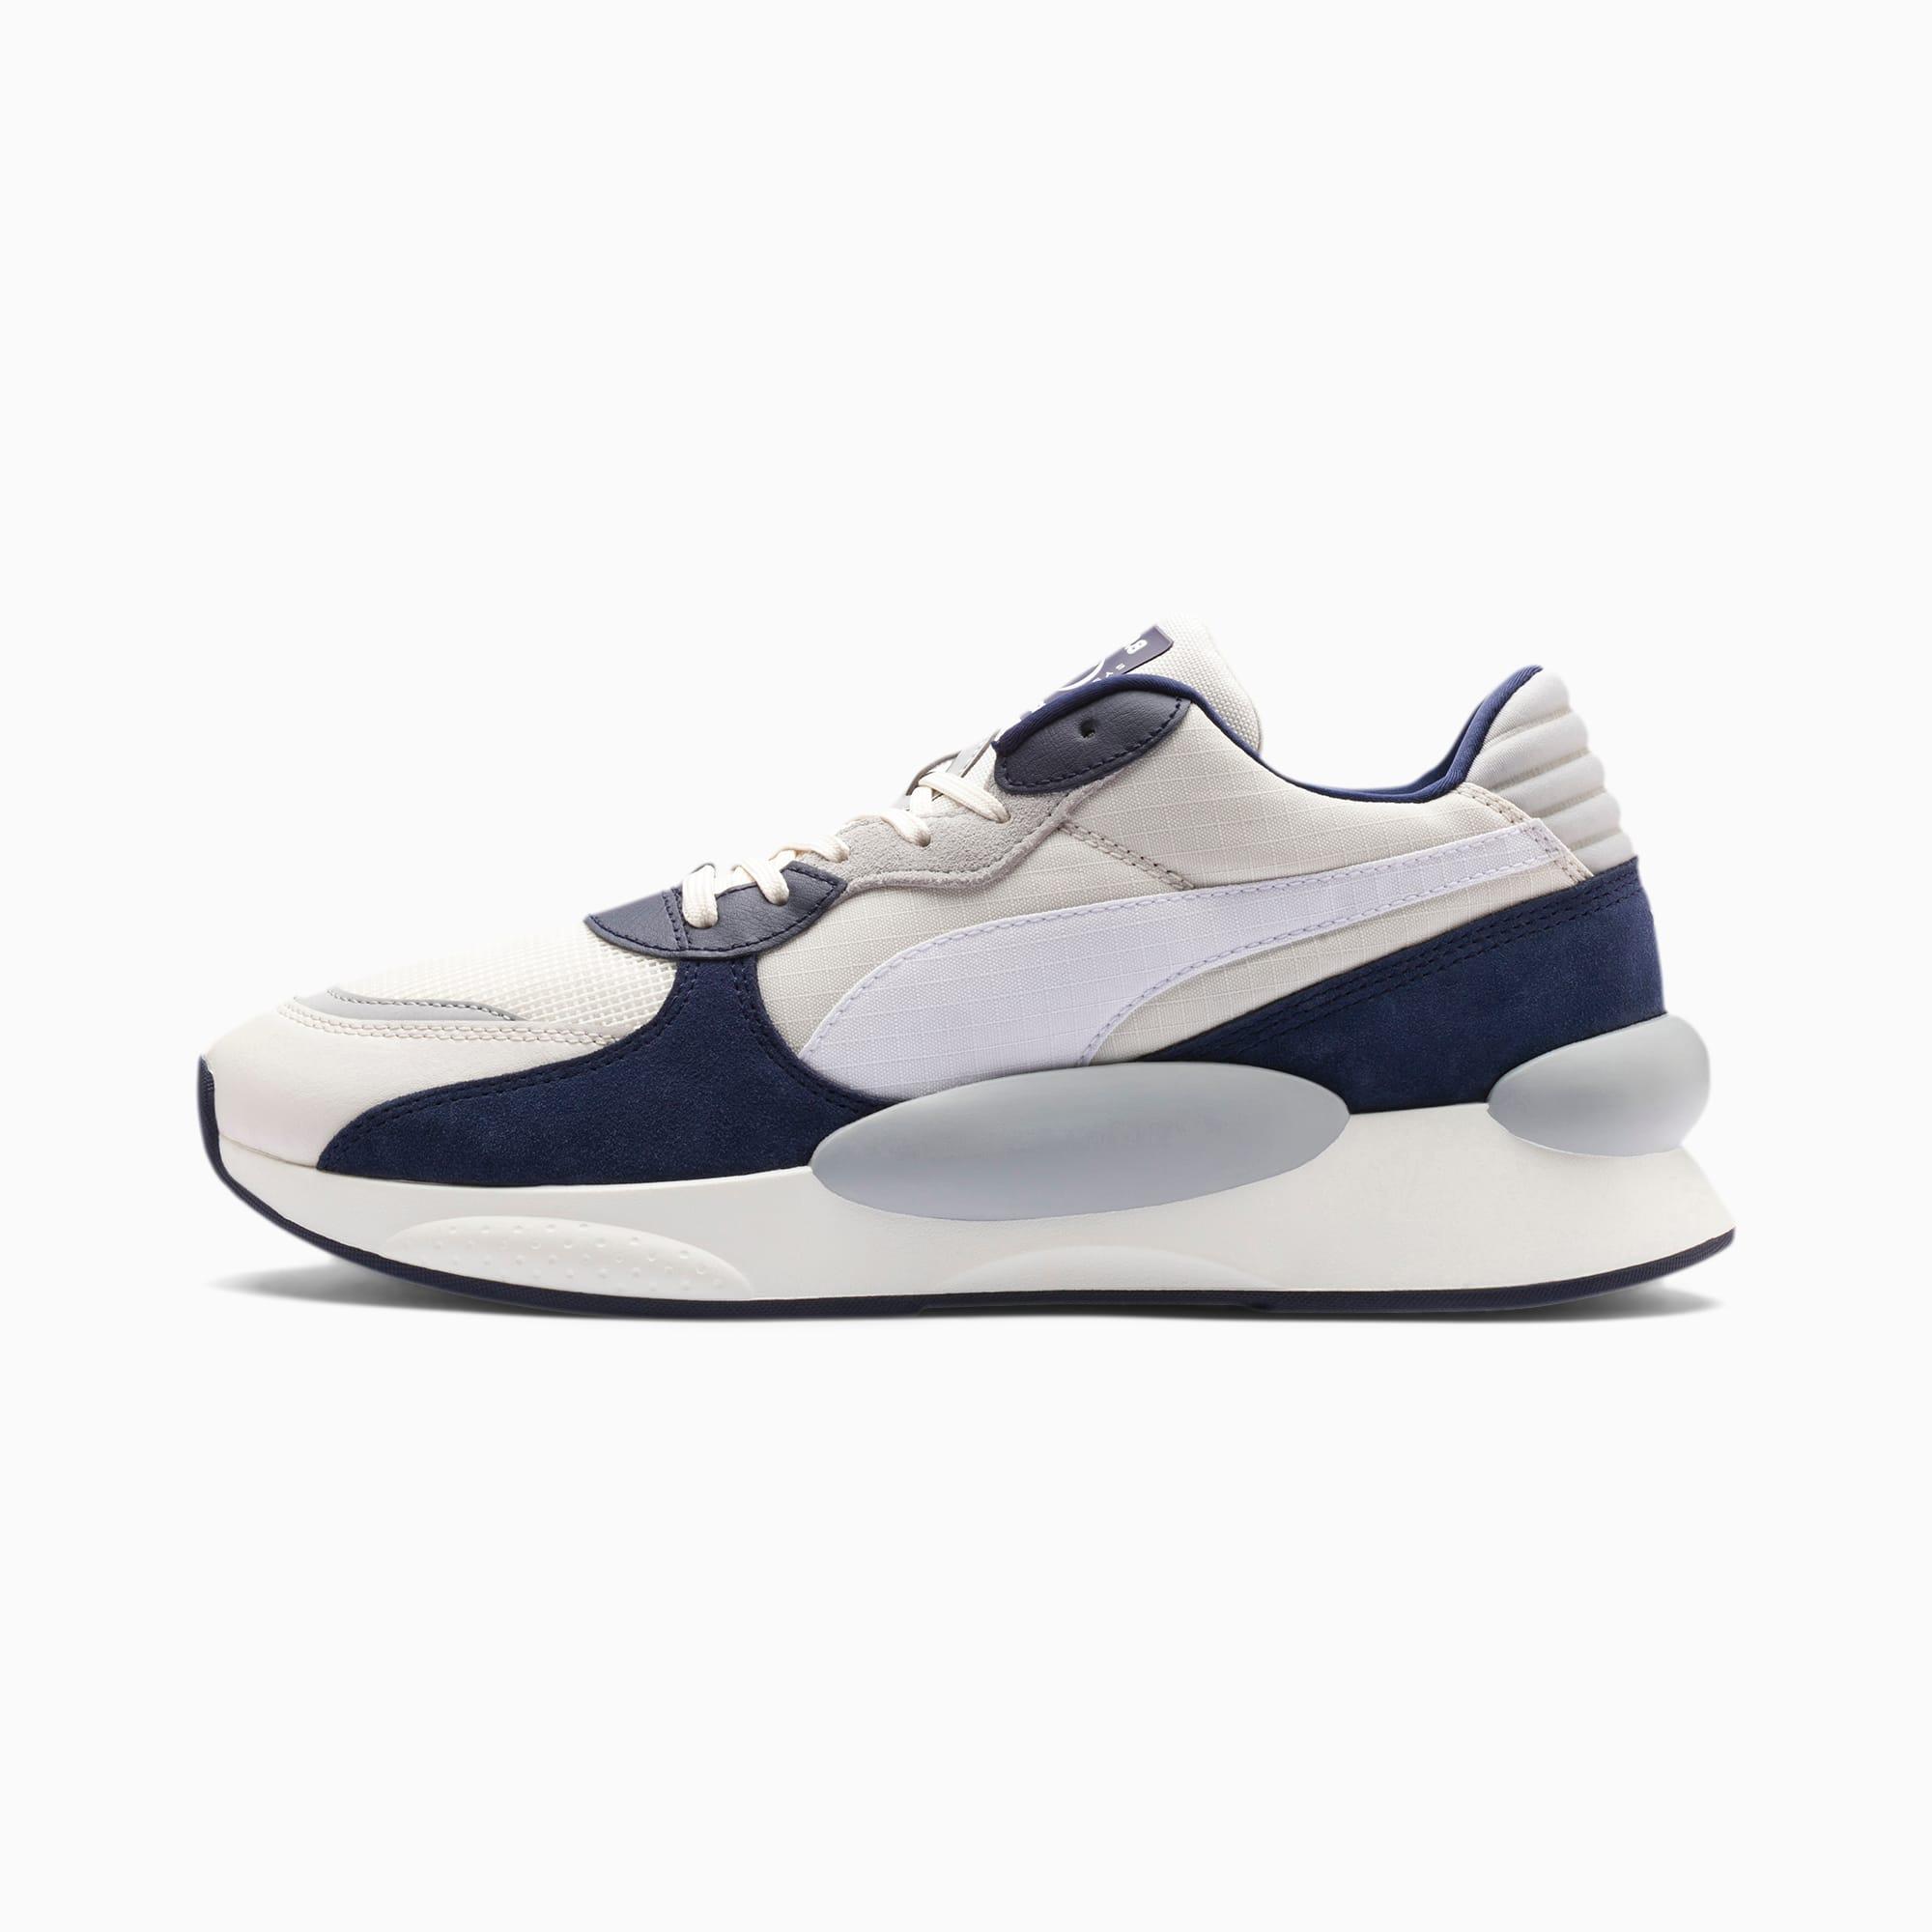 RS 9.8 Space Men's Sneakers